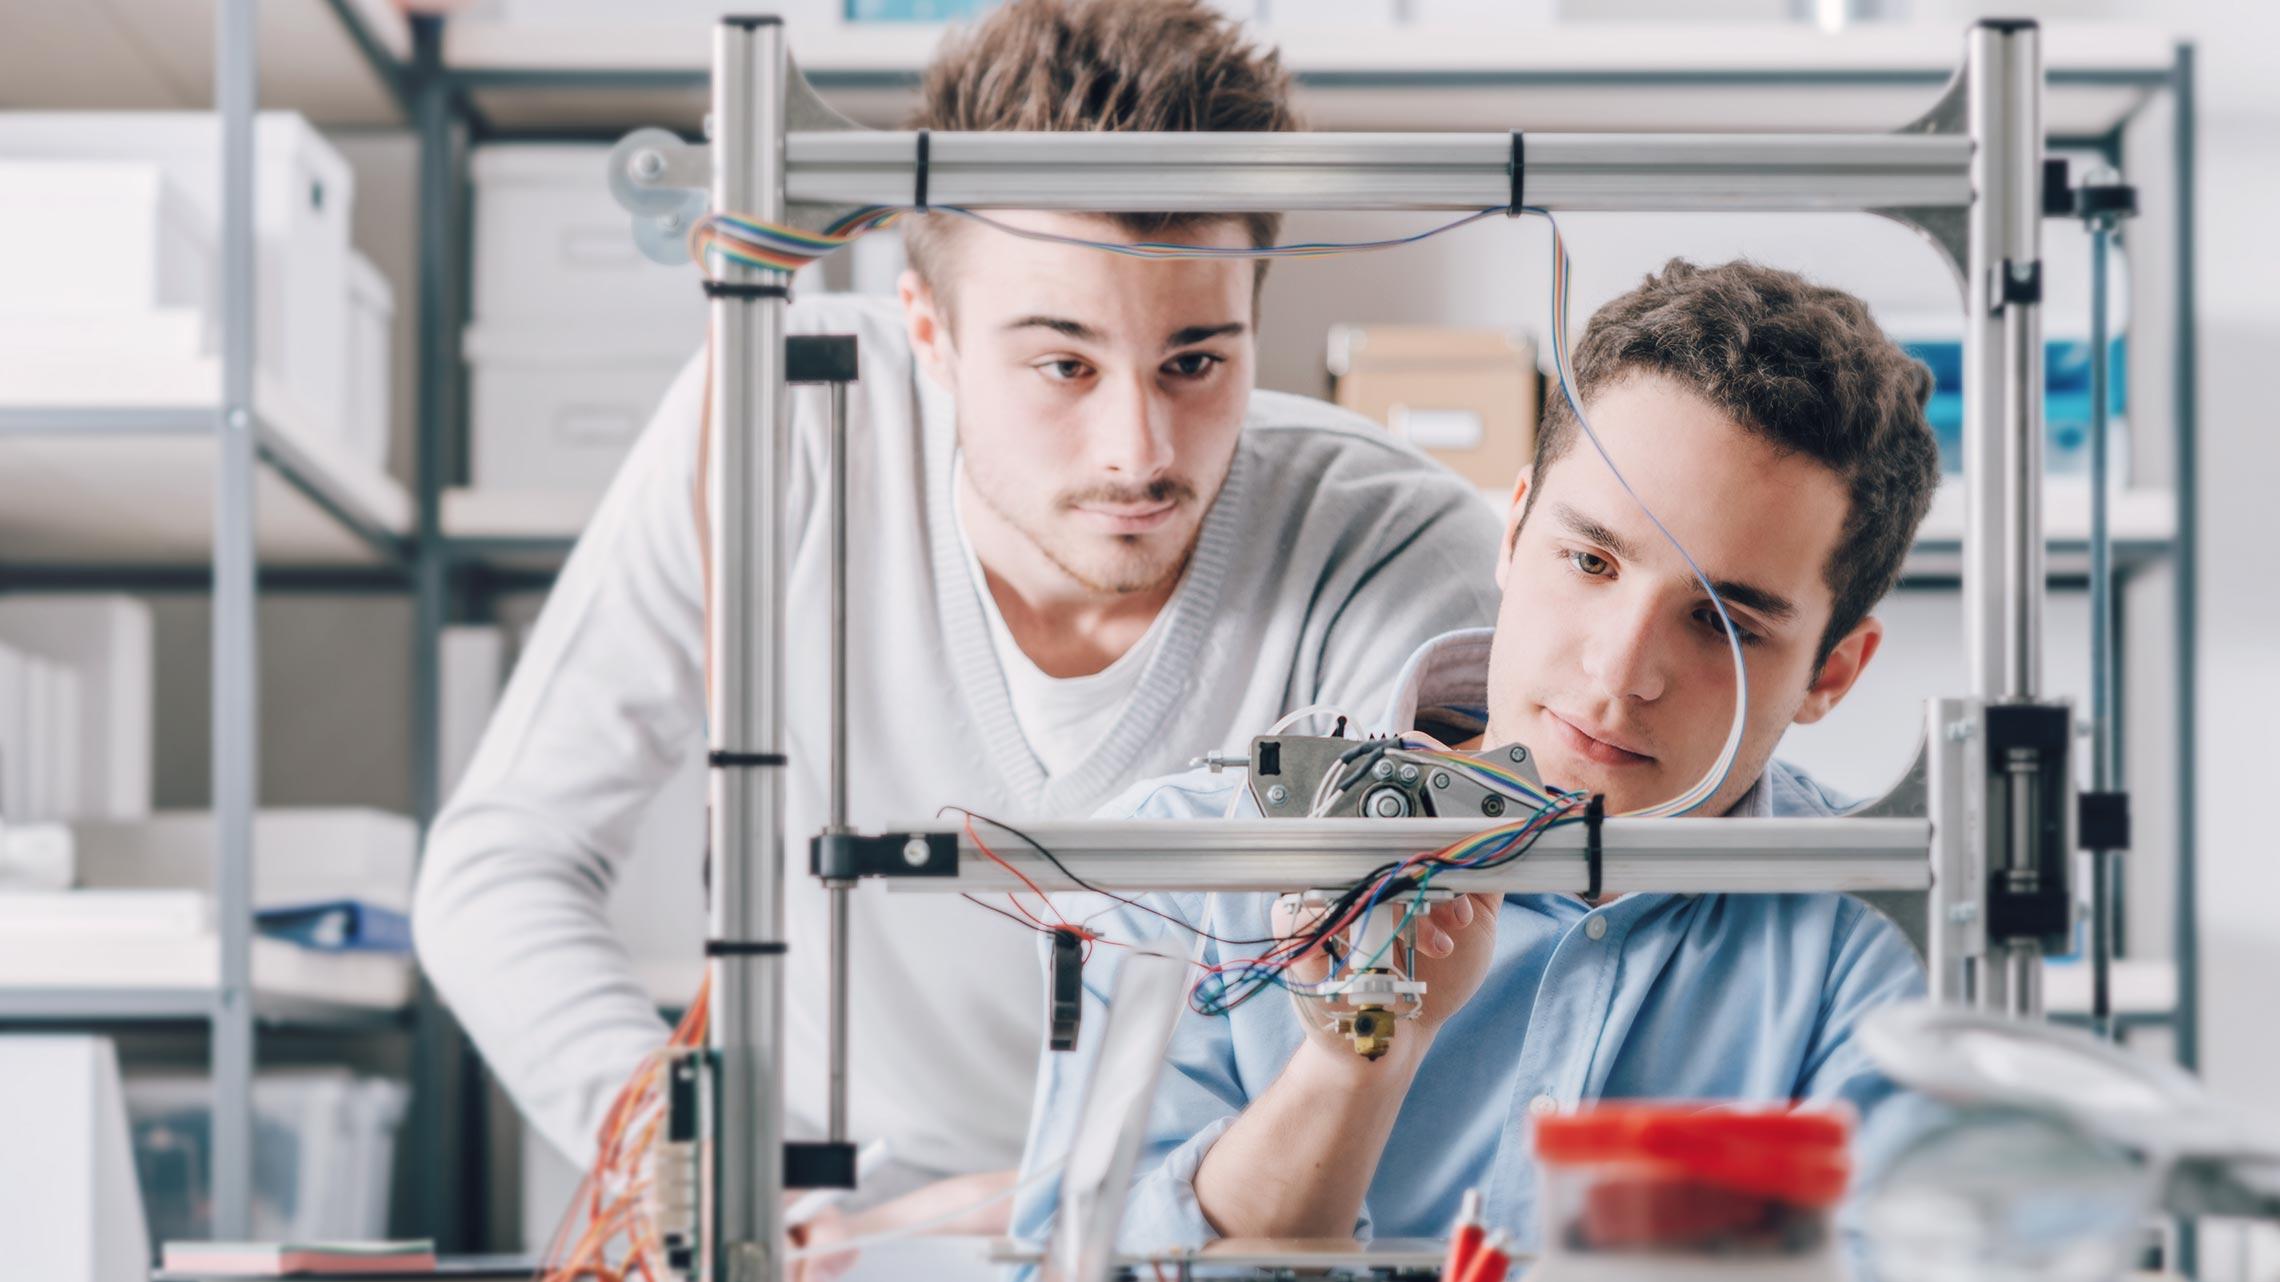 TecInnov – 2nd edition Santander Universidades 2018: applications open